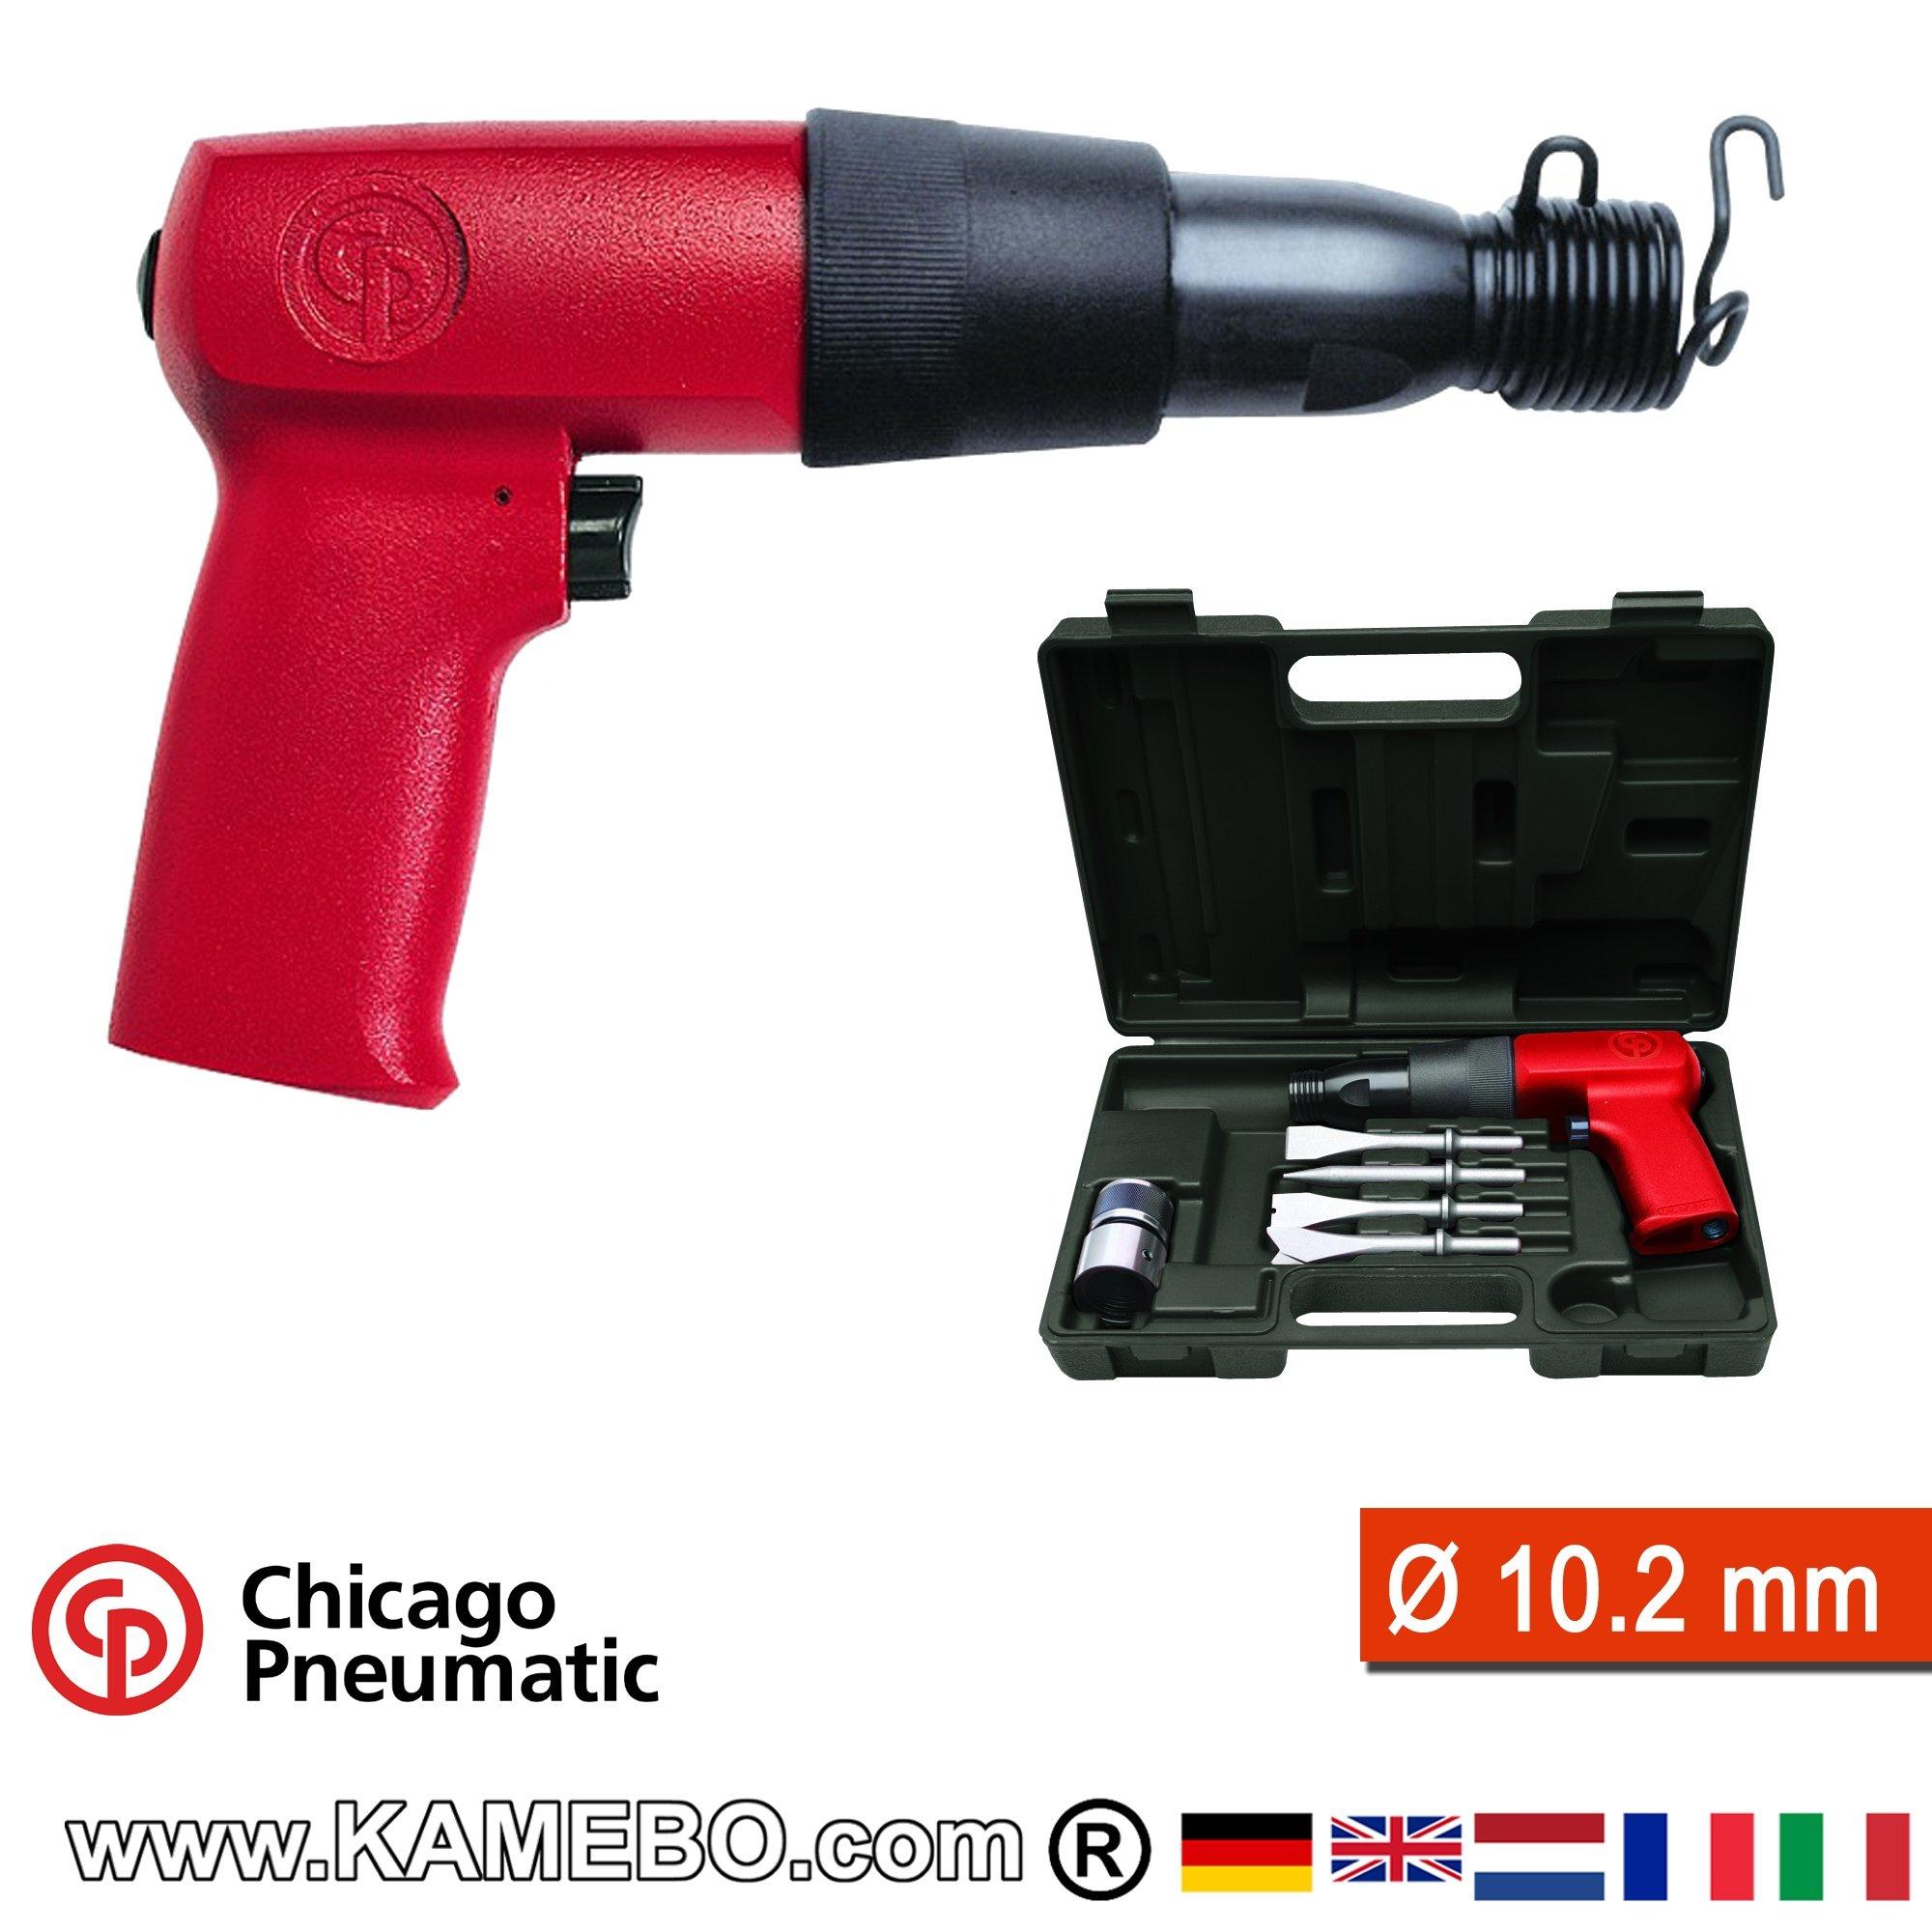 Chicago Pneumatic Air Hammer Kit 7110K